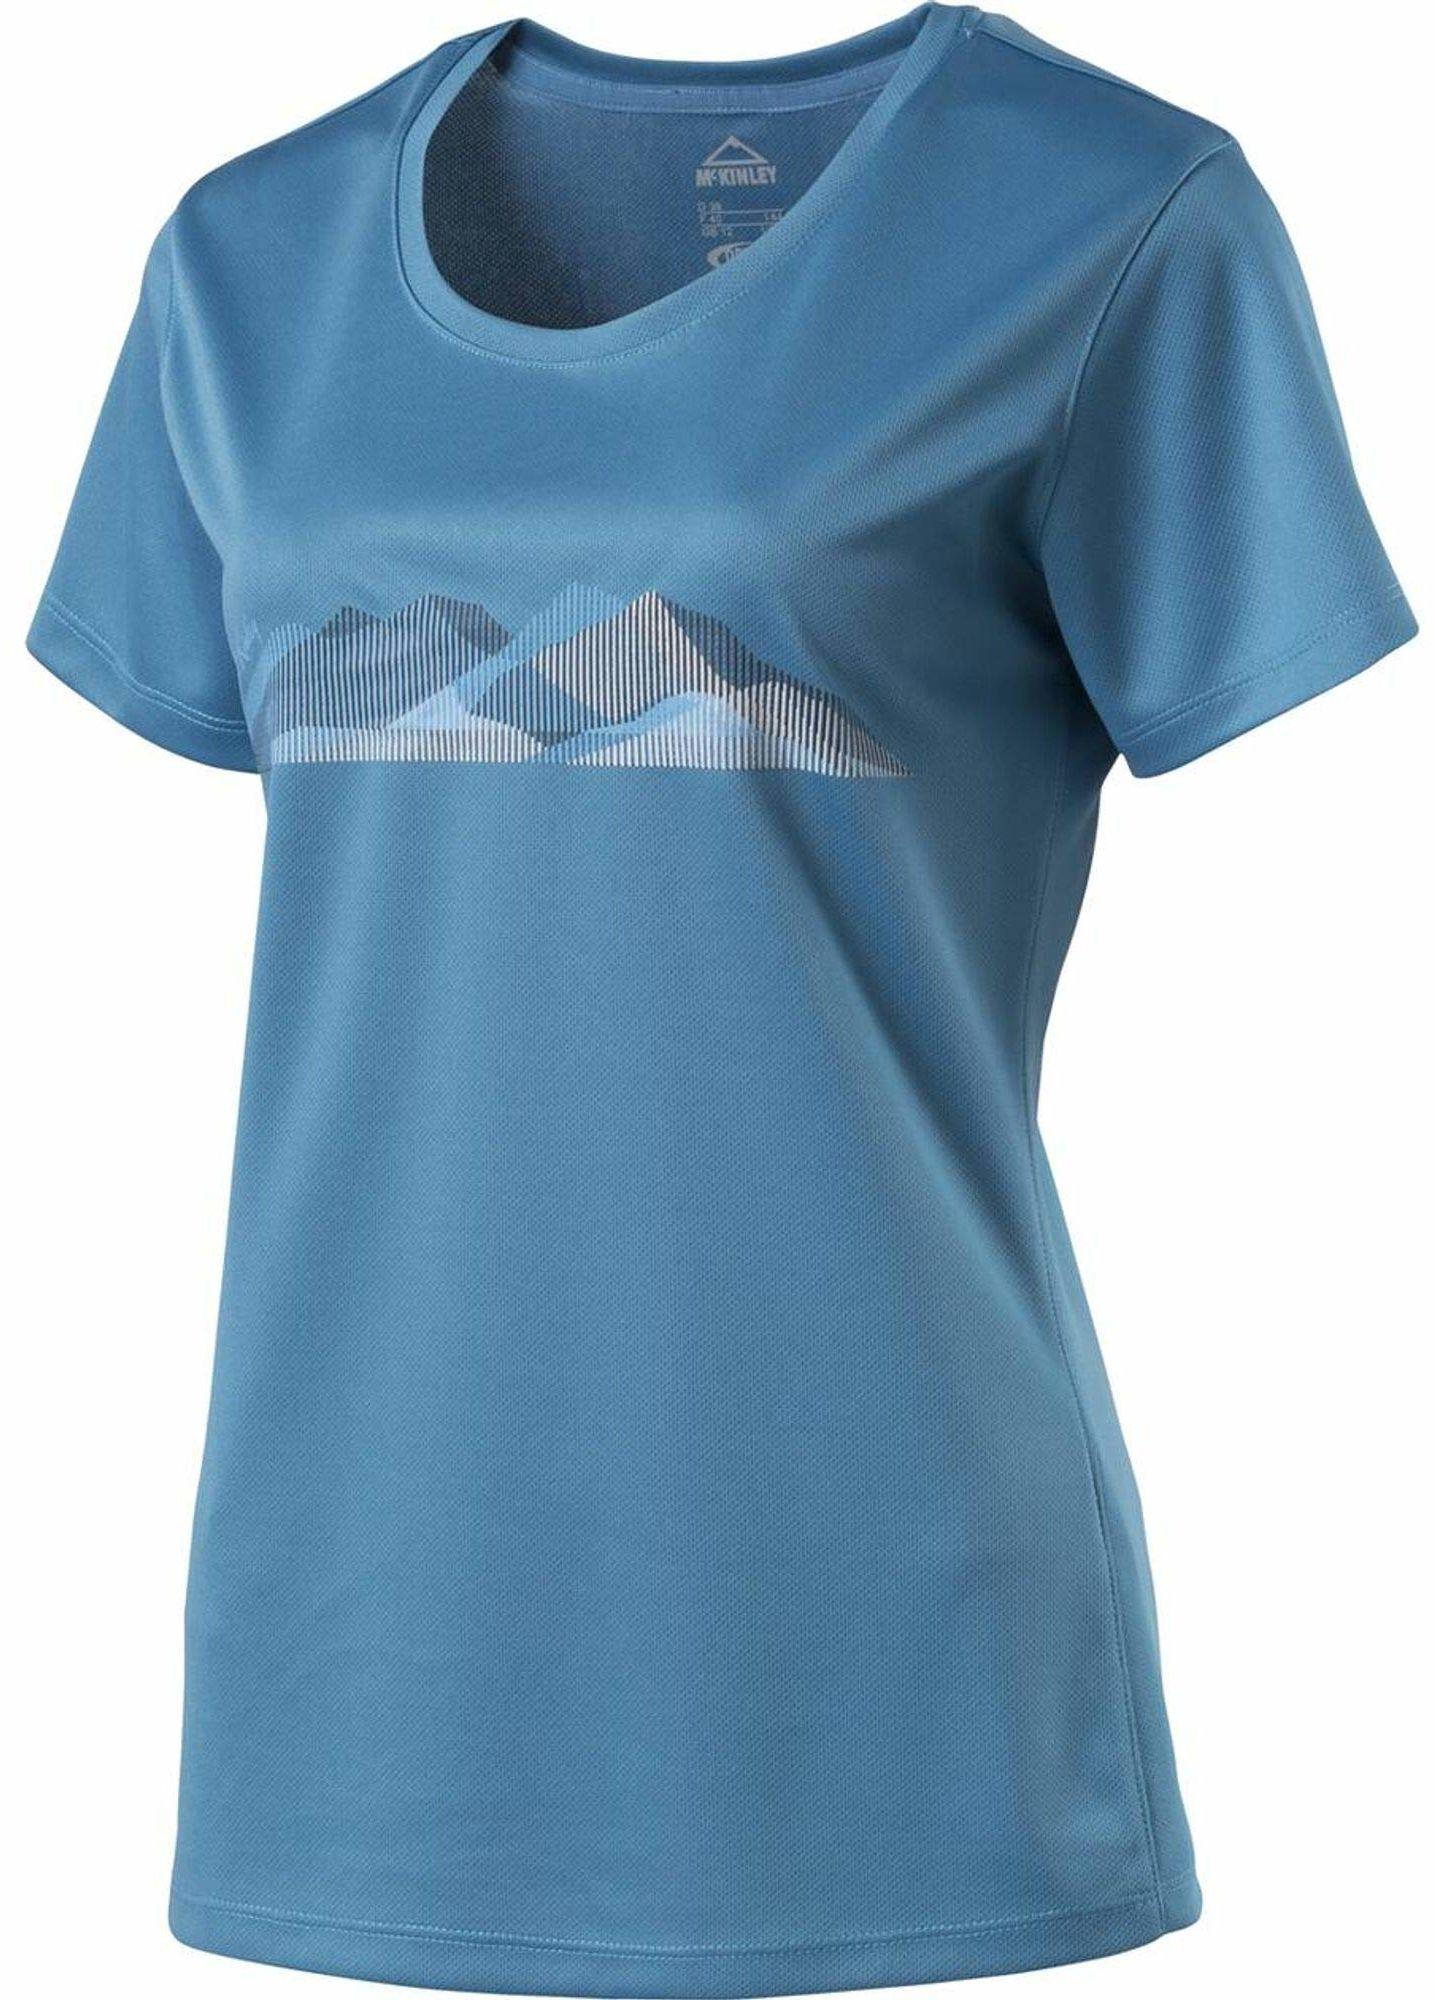 McKinley damska koszulka Raffa NIEBIESKI Size 40